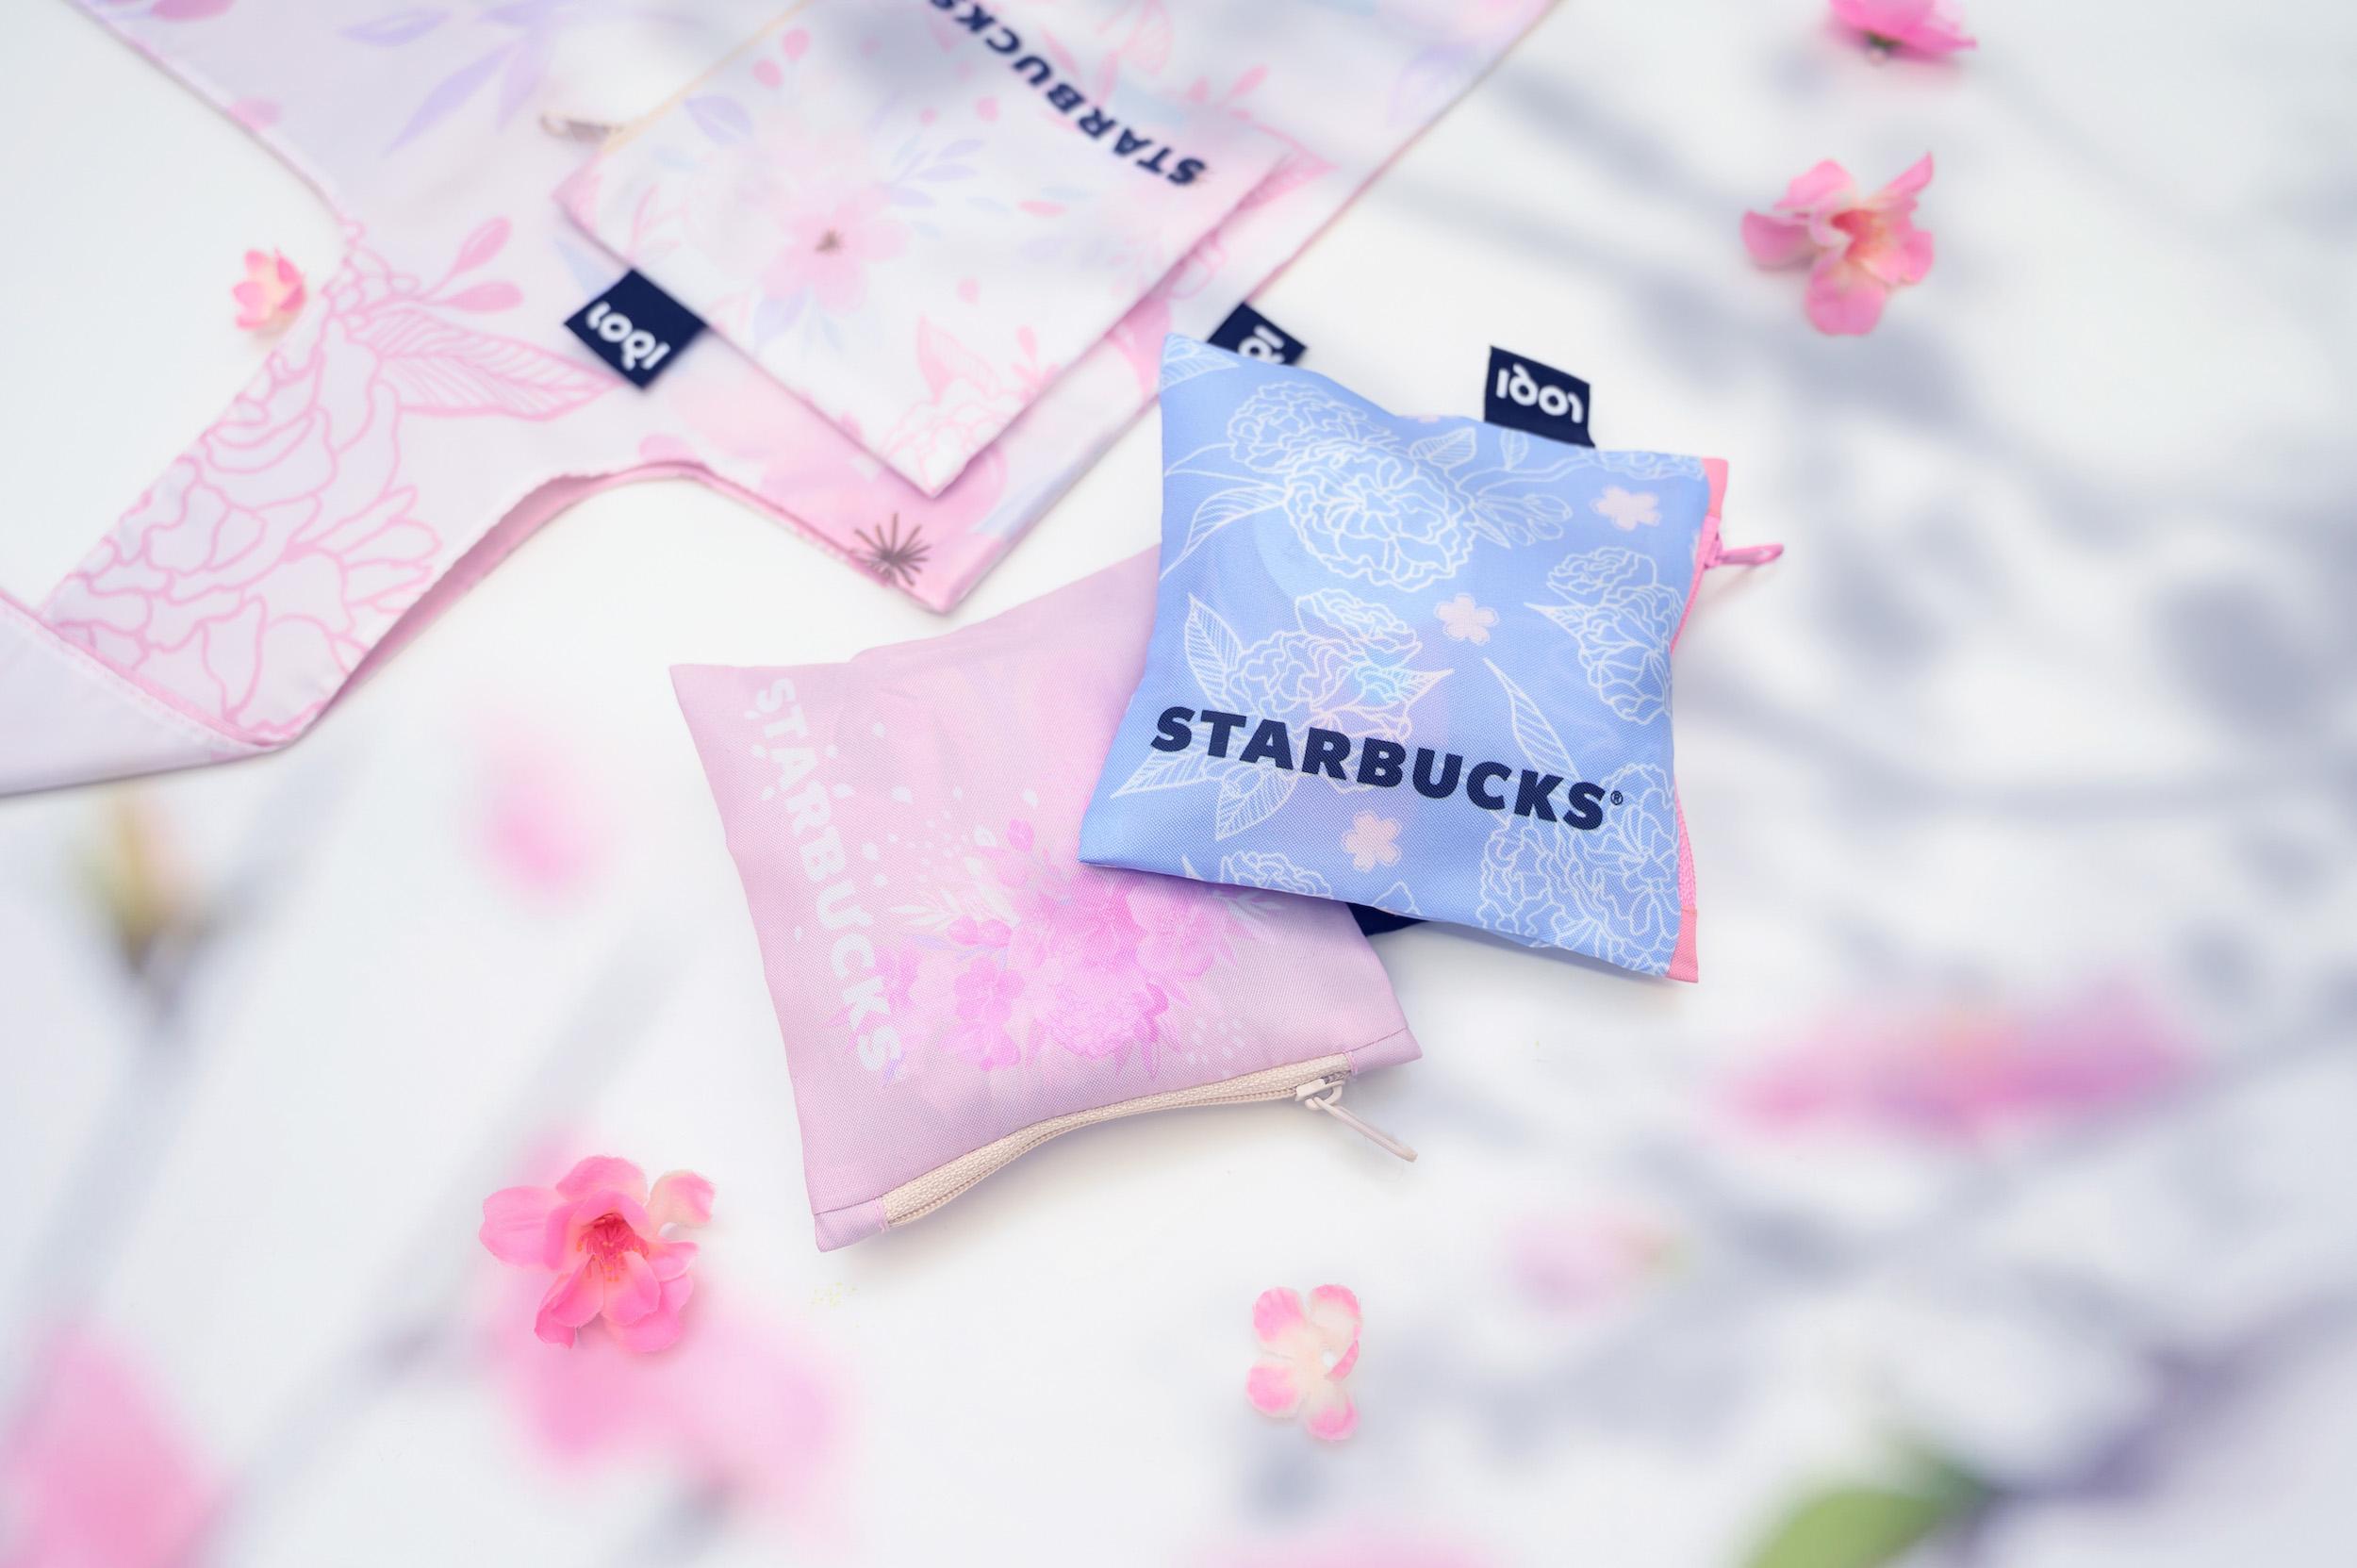 Starbucks® x LOQI Reusable Bags